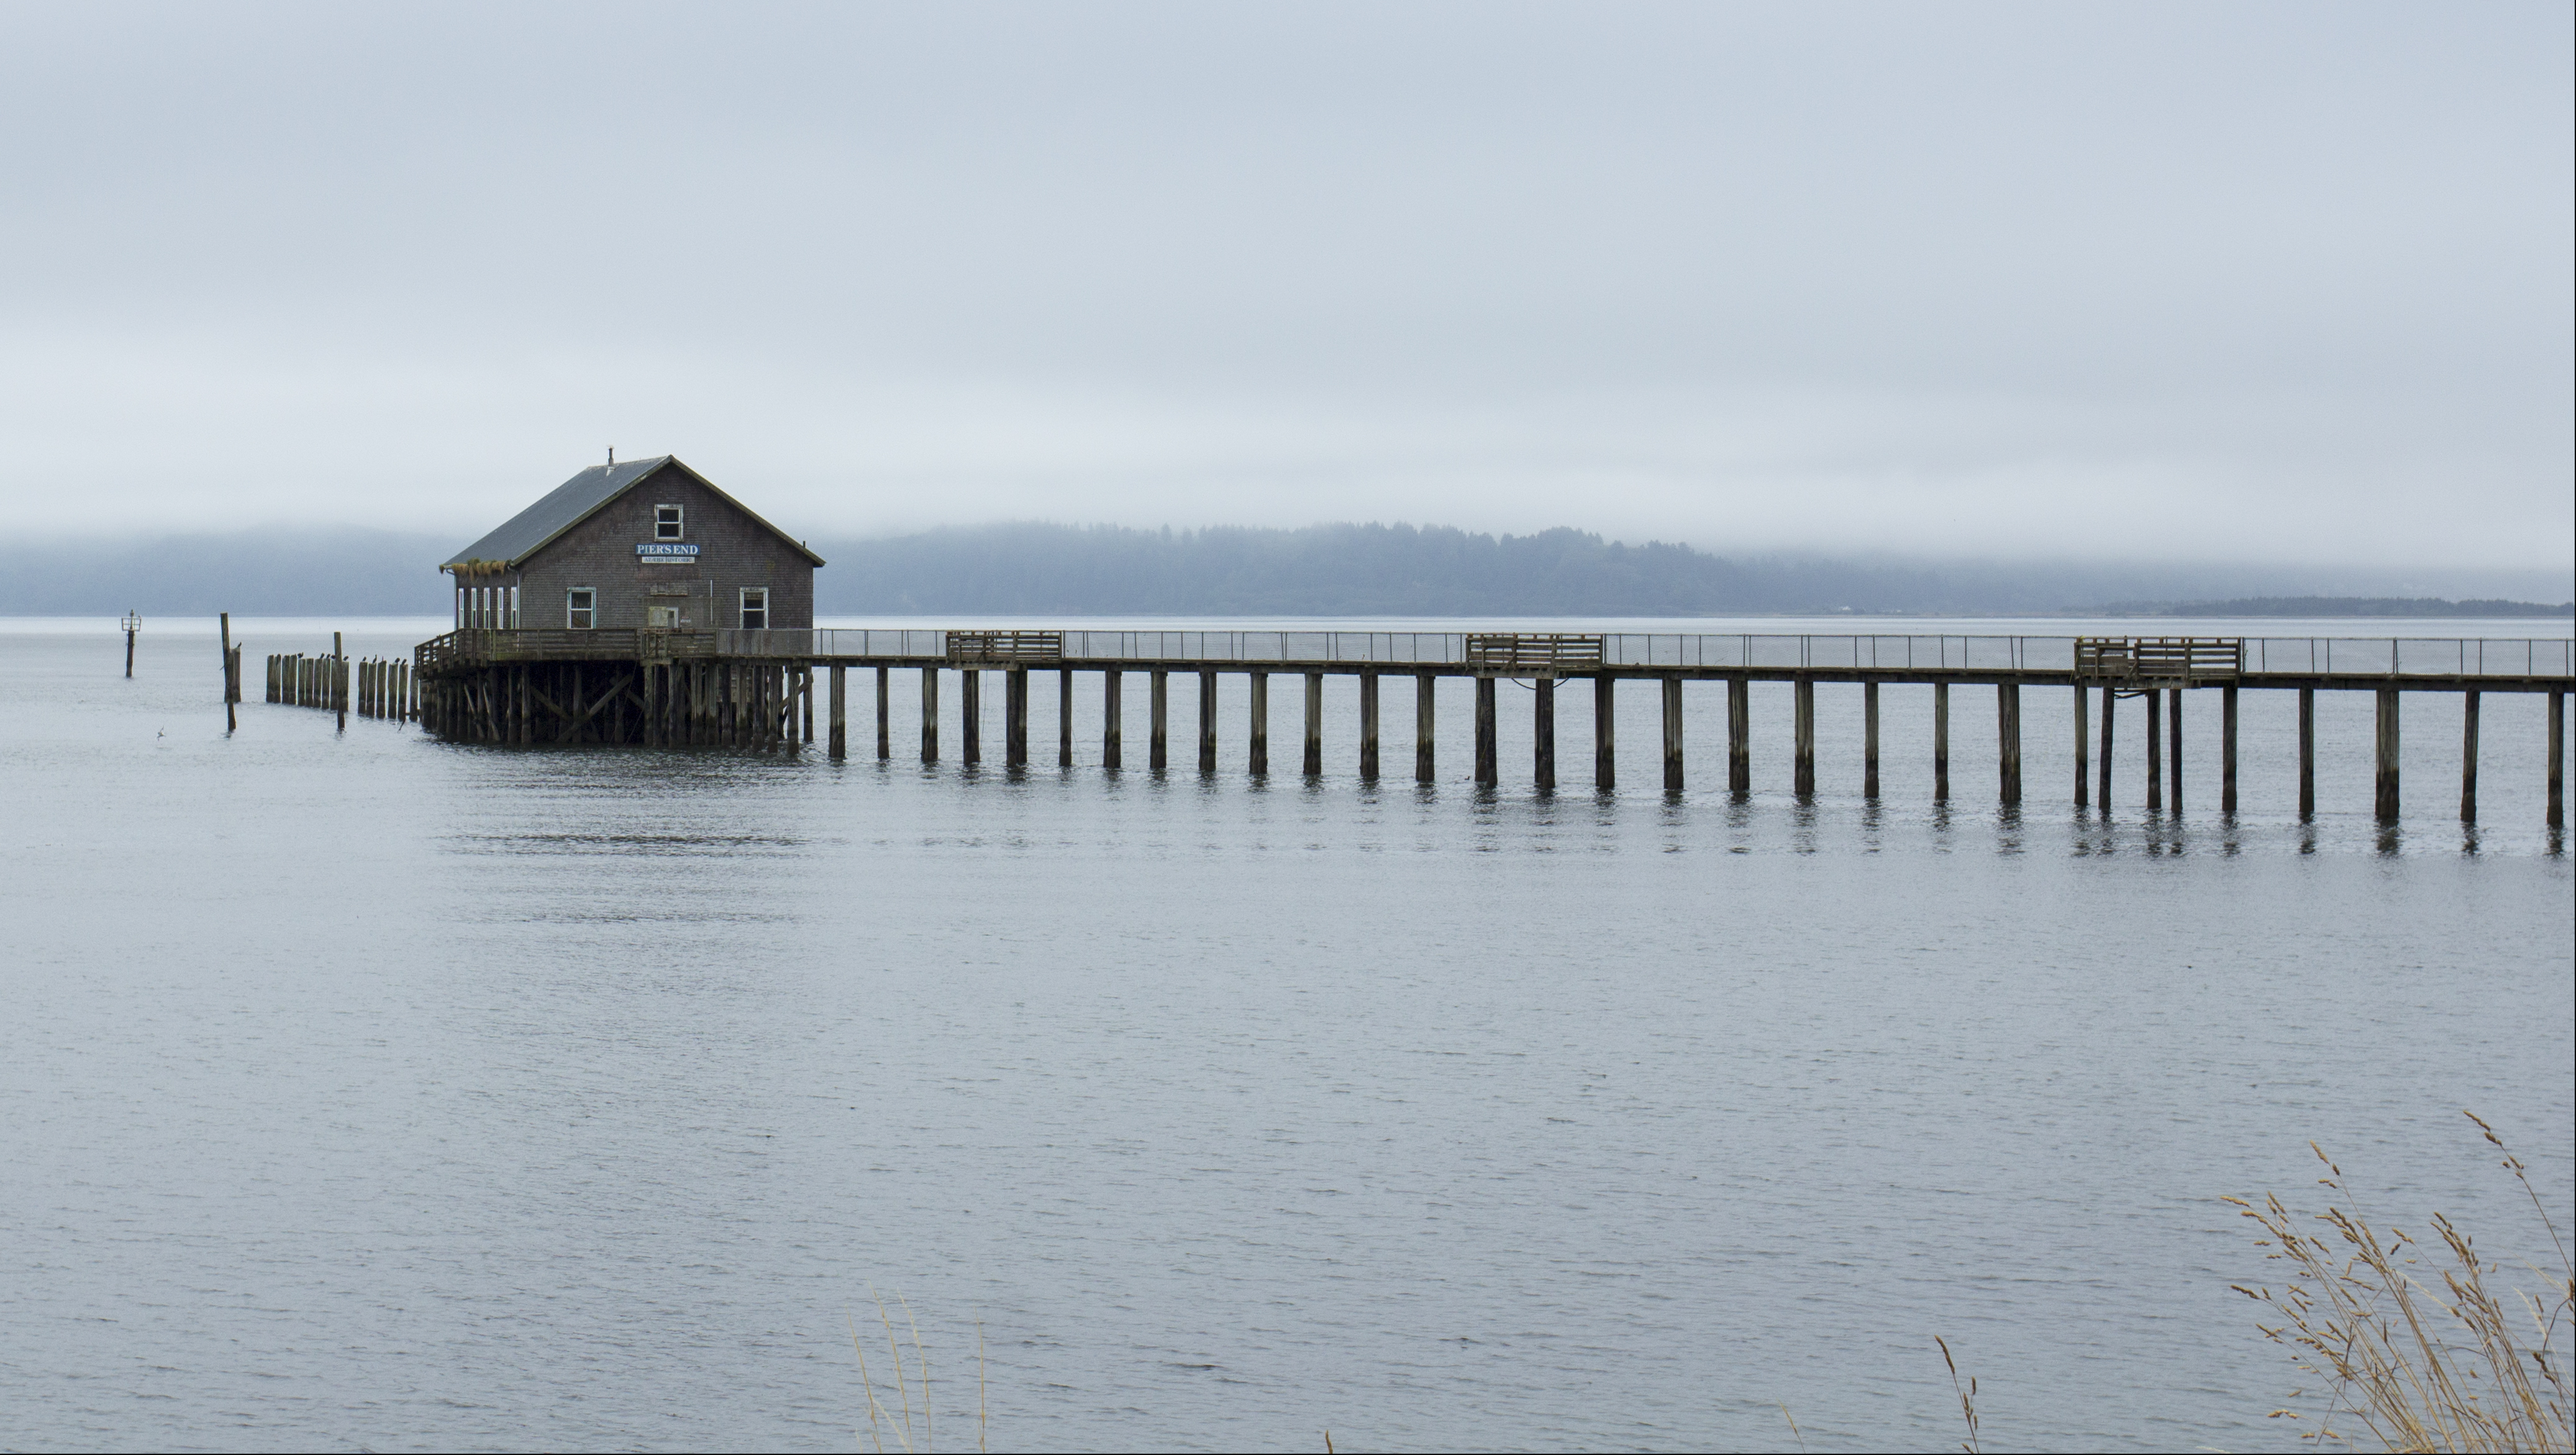 Tillamook Bay, Garibaldi, Oregon, Bay, Bridge, Fog, House, HQ Photo